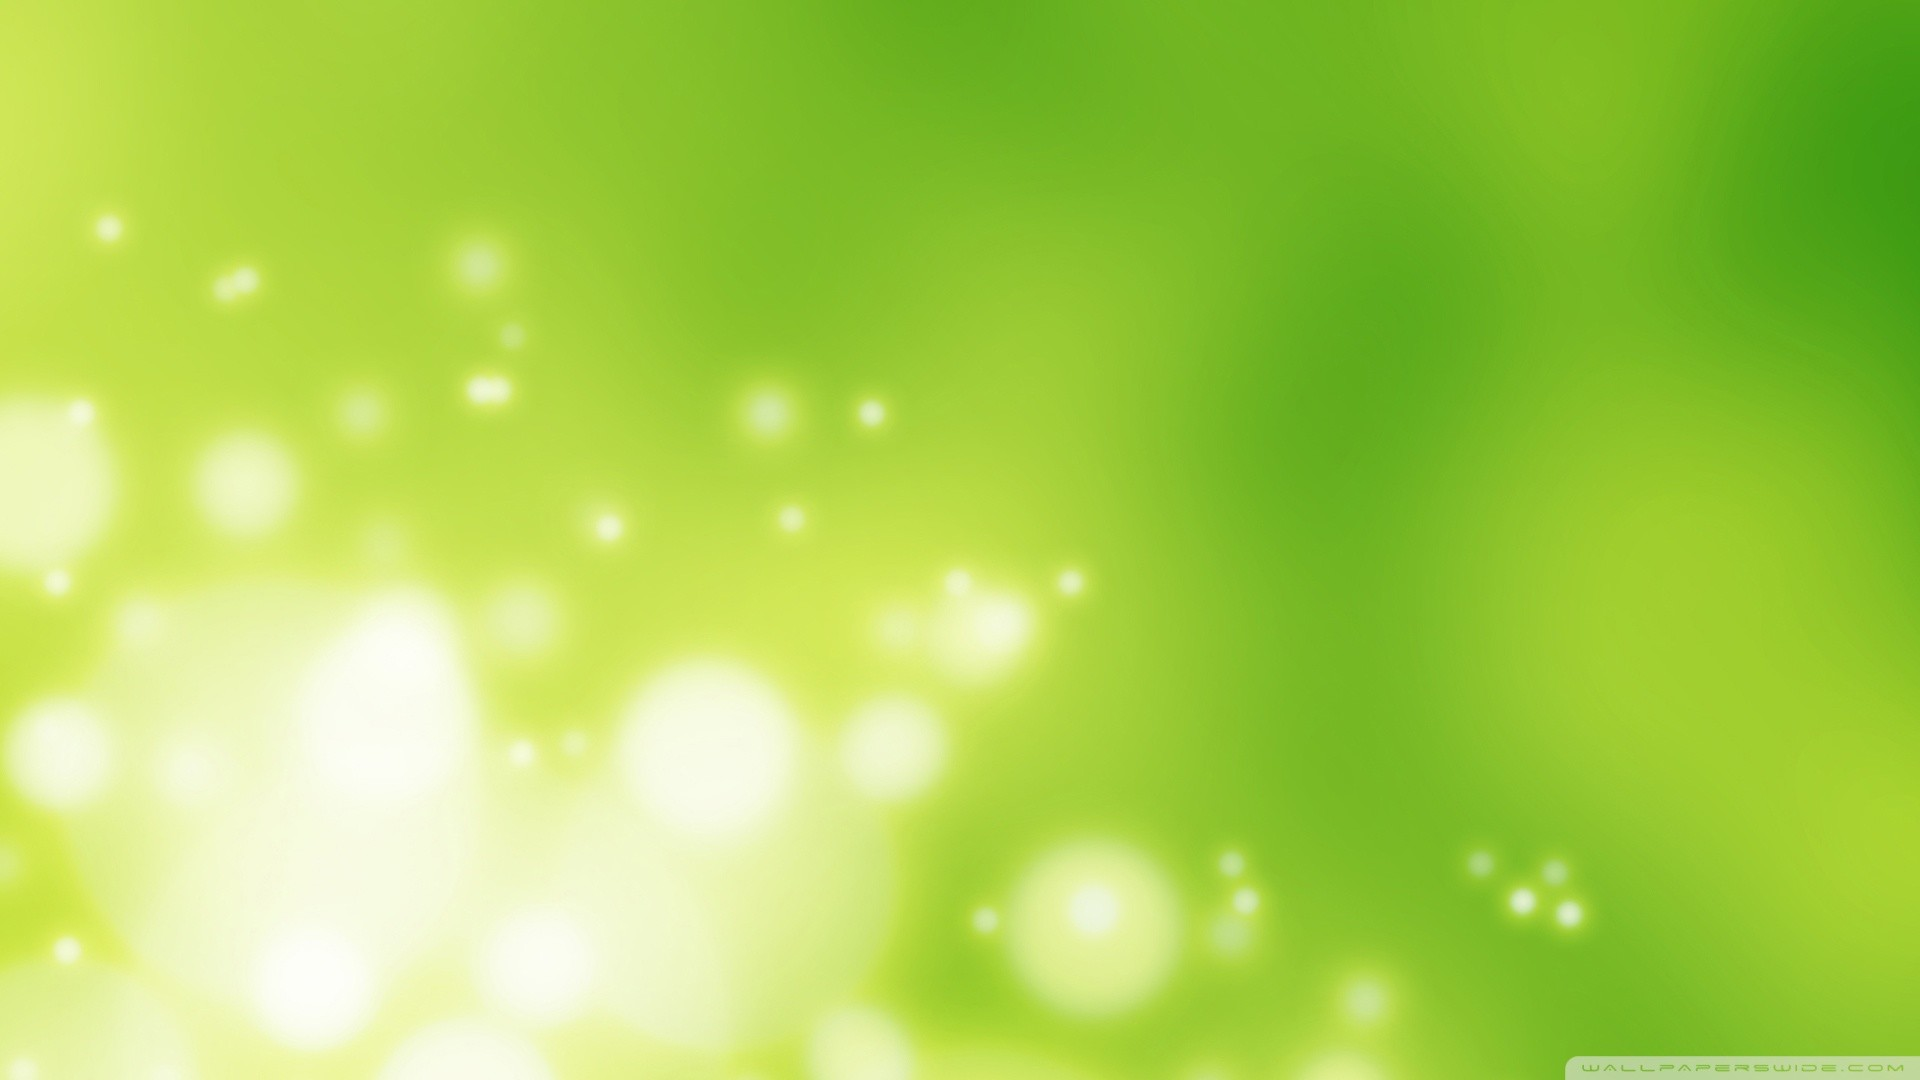 Green Lime Dust Wallpaper 1920×1080 Green, Lime, Dust